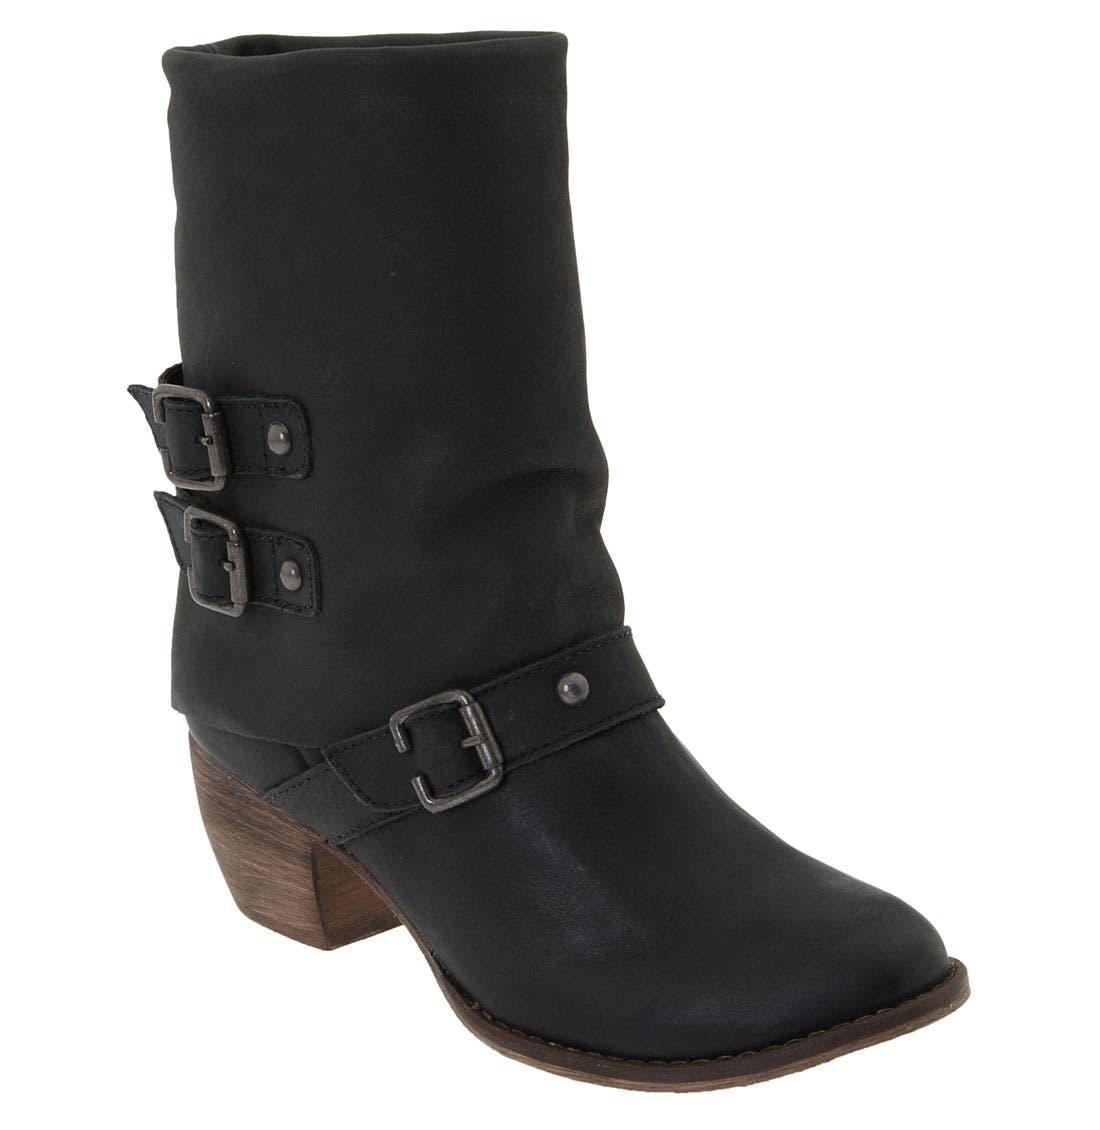 Main Image - MIA Limited Edition 'Buckaroo' Ankle Boot